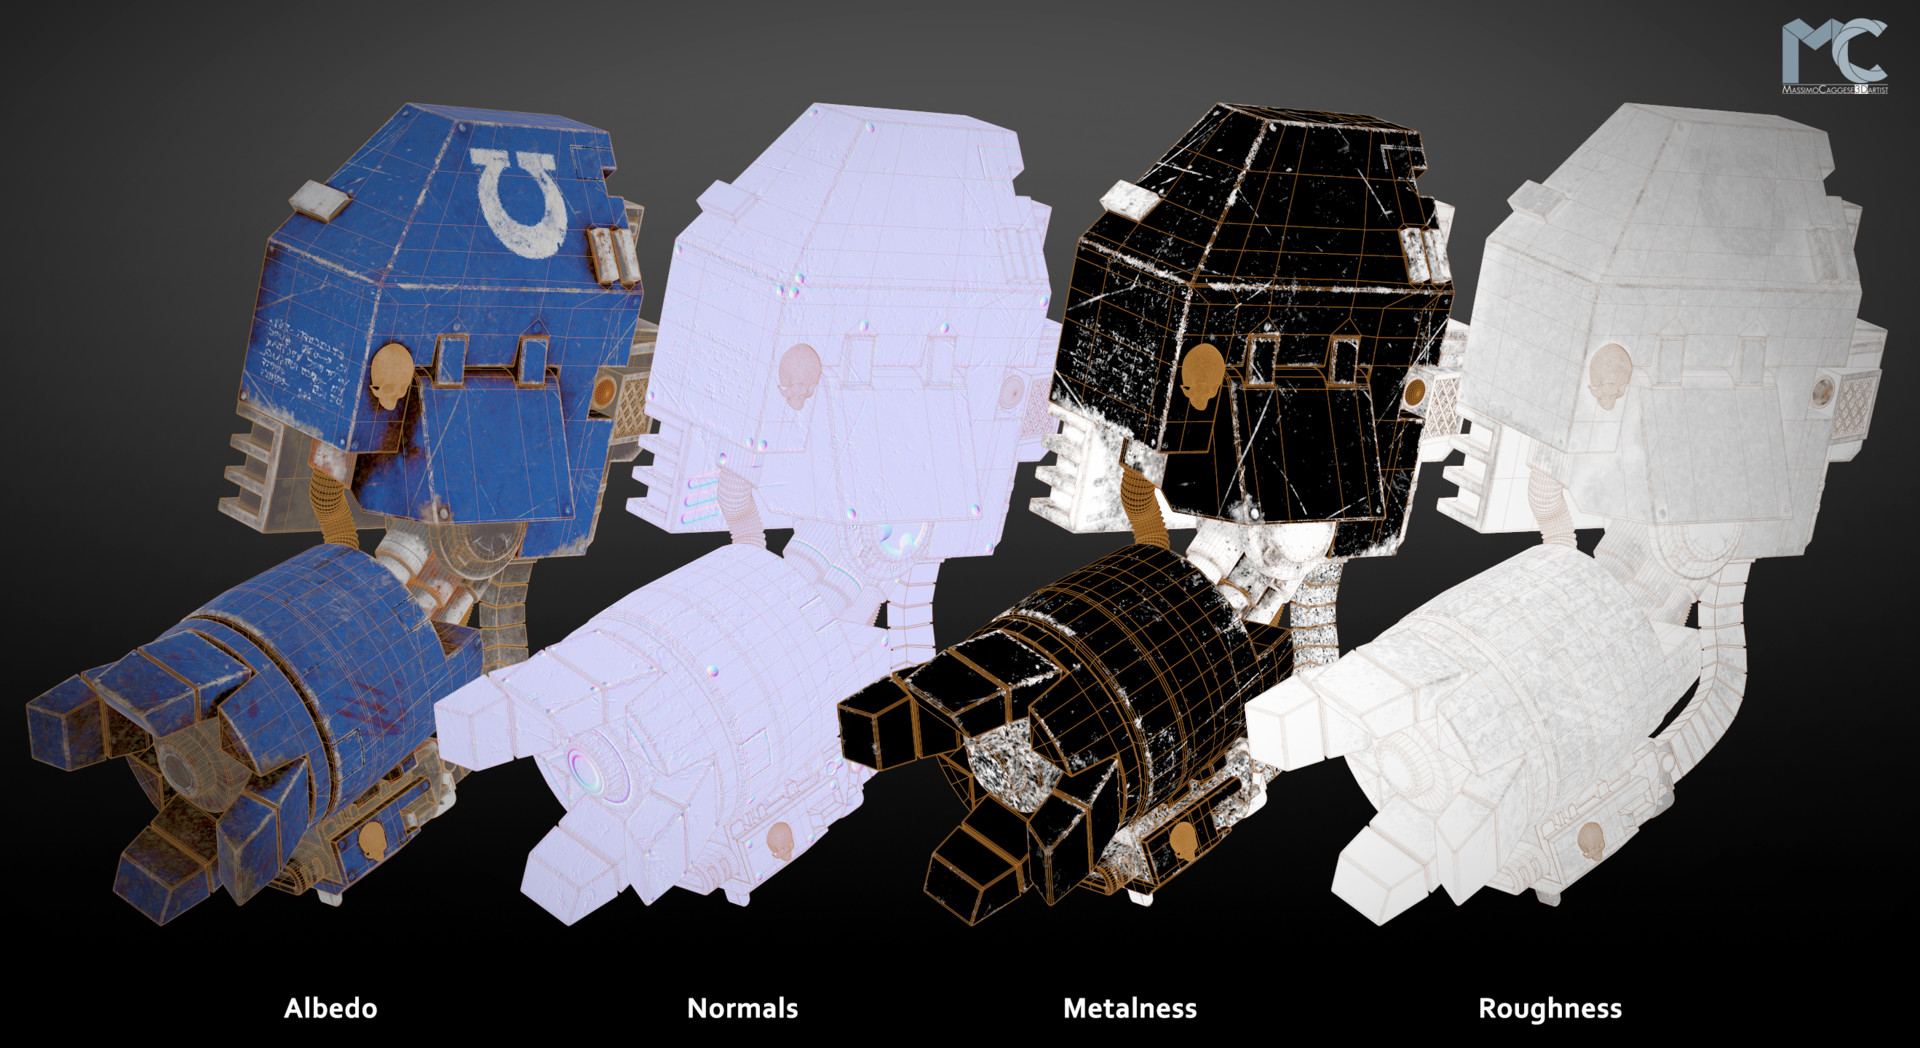 Maps displayed: Albedo, Normals, Metalness, Roughness